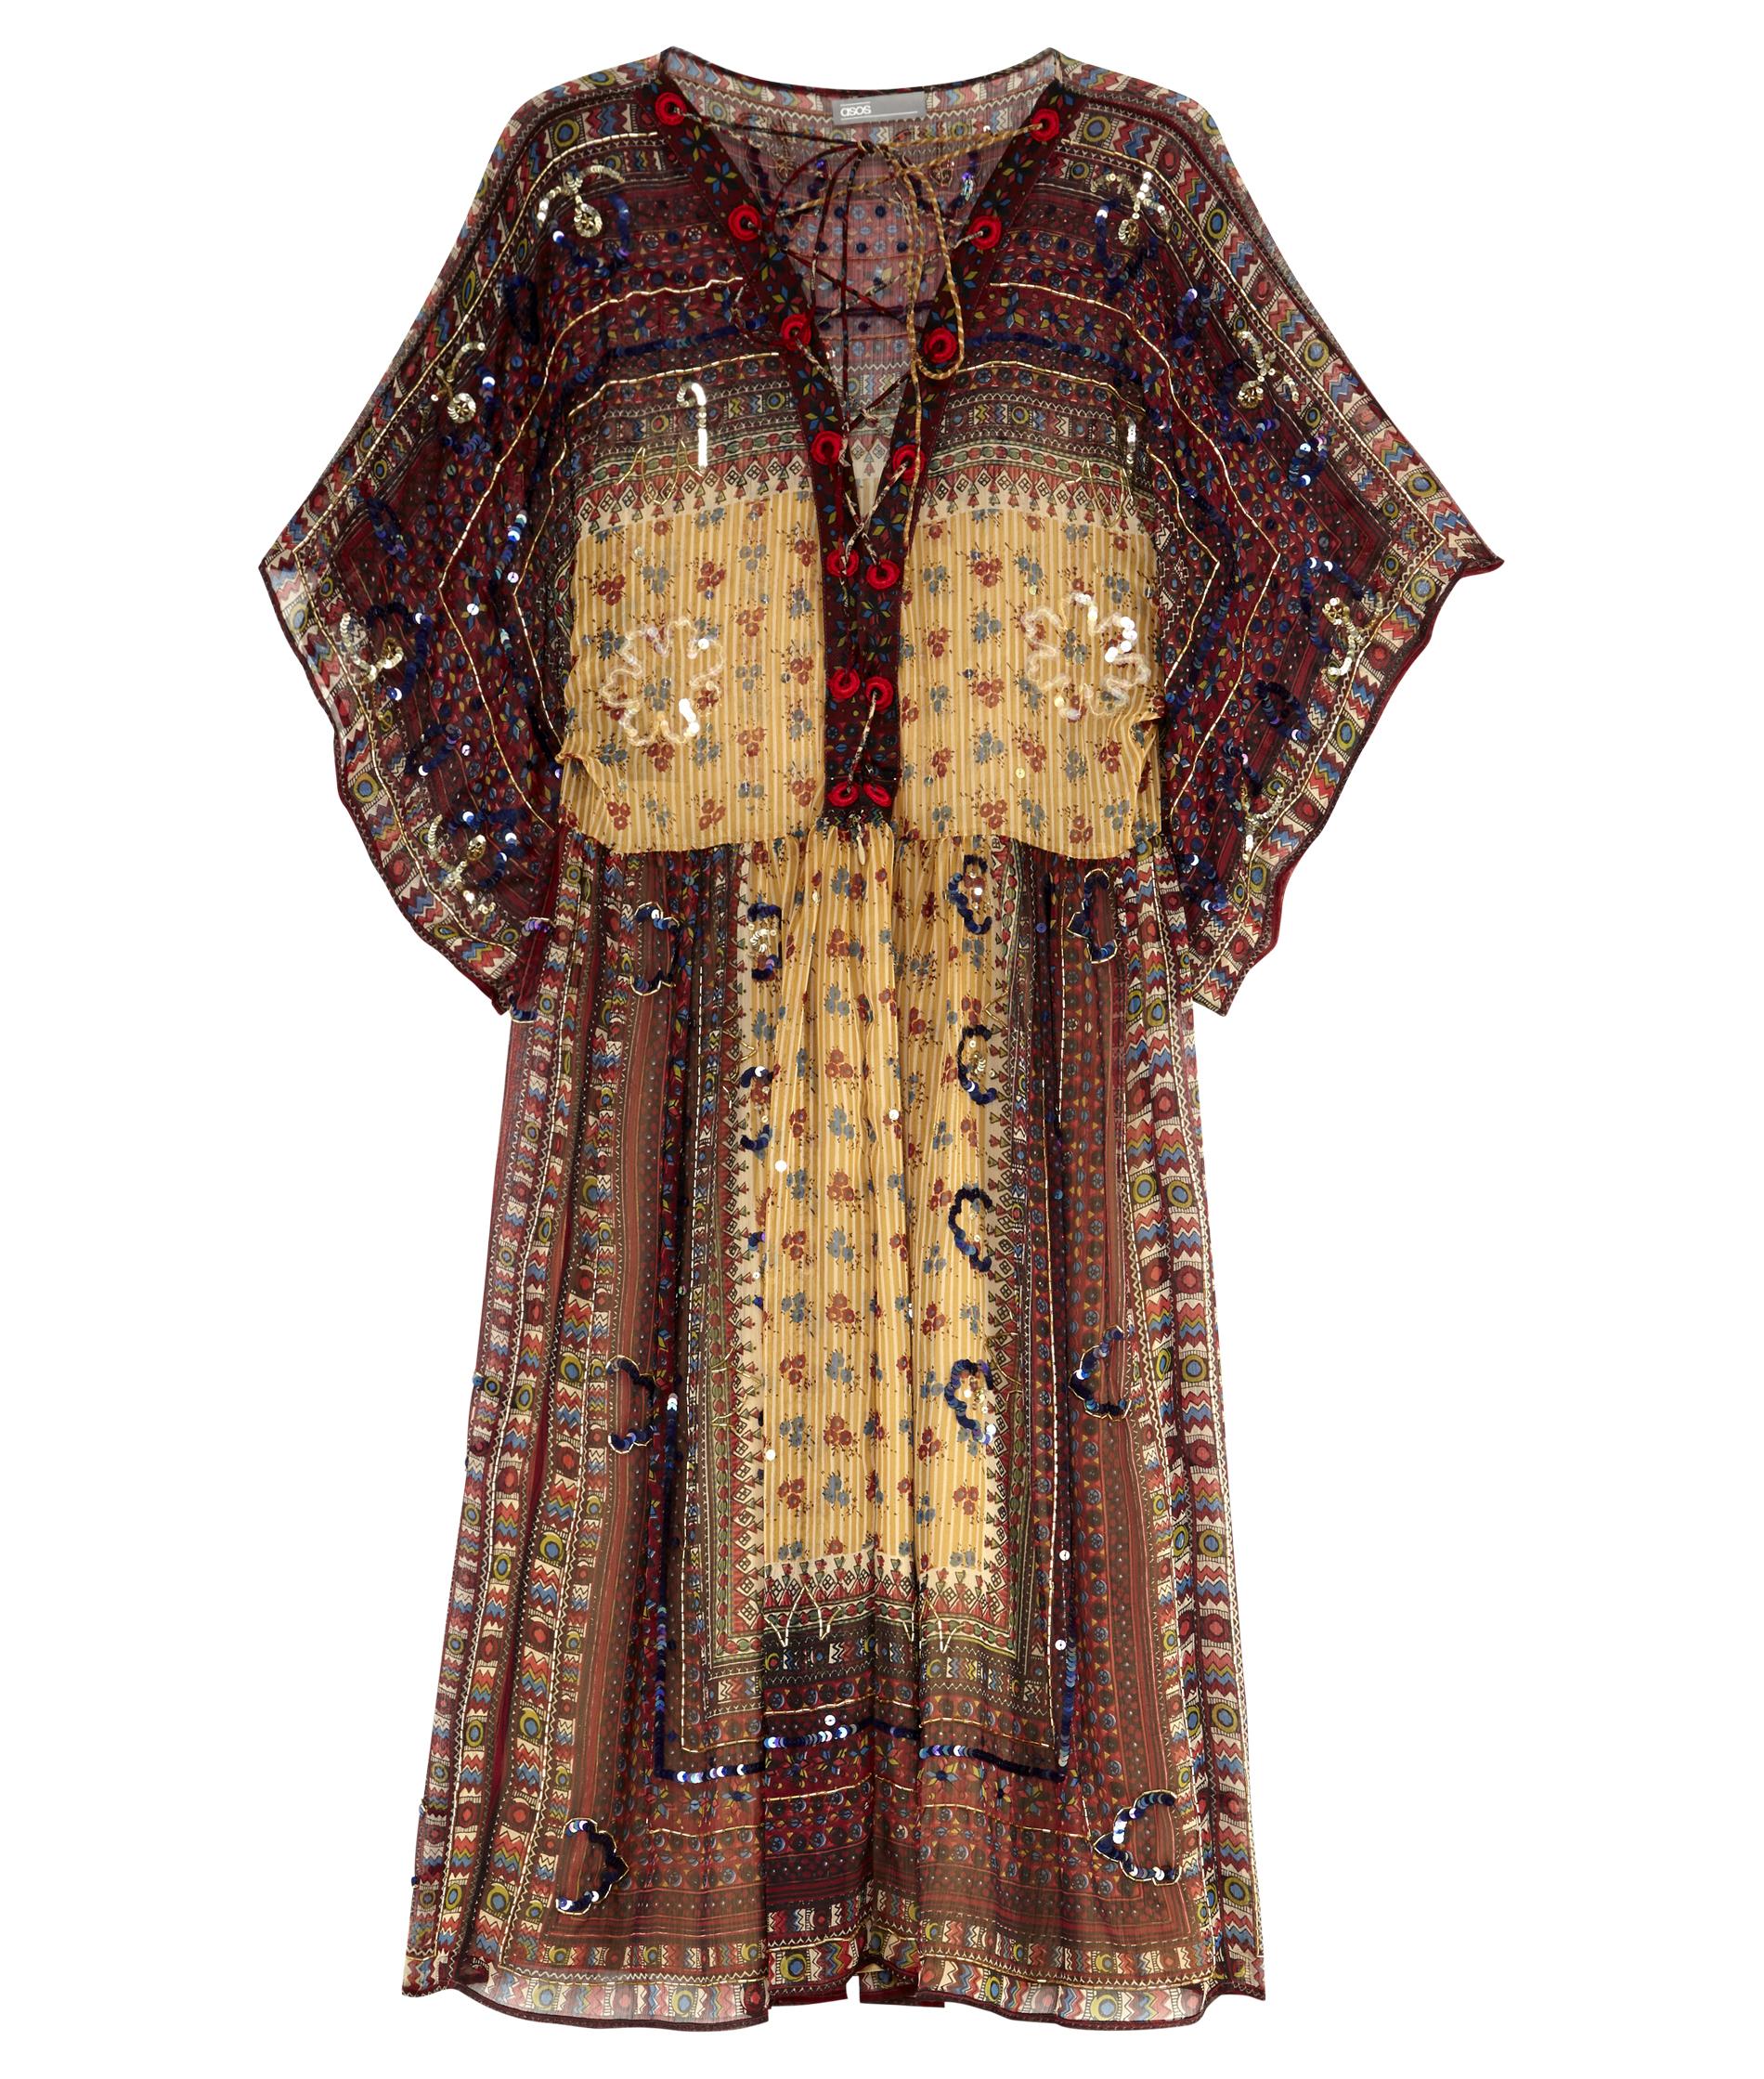 robe hippie asos envie d une robe hippie elle. Black Bedroom Furniture Sets. Home Design Ideas